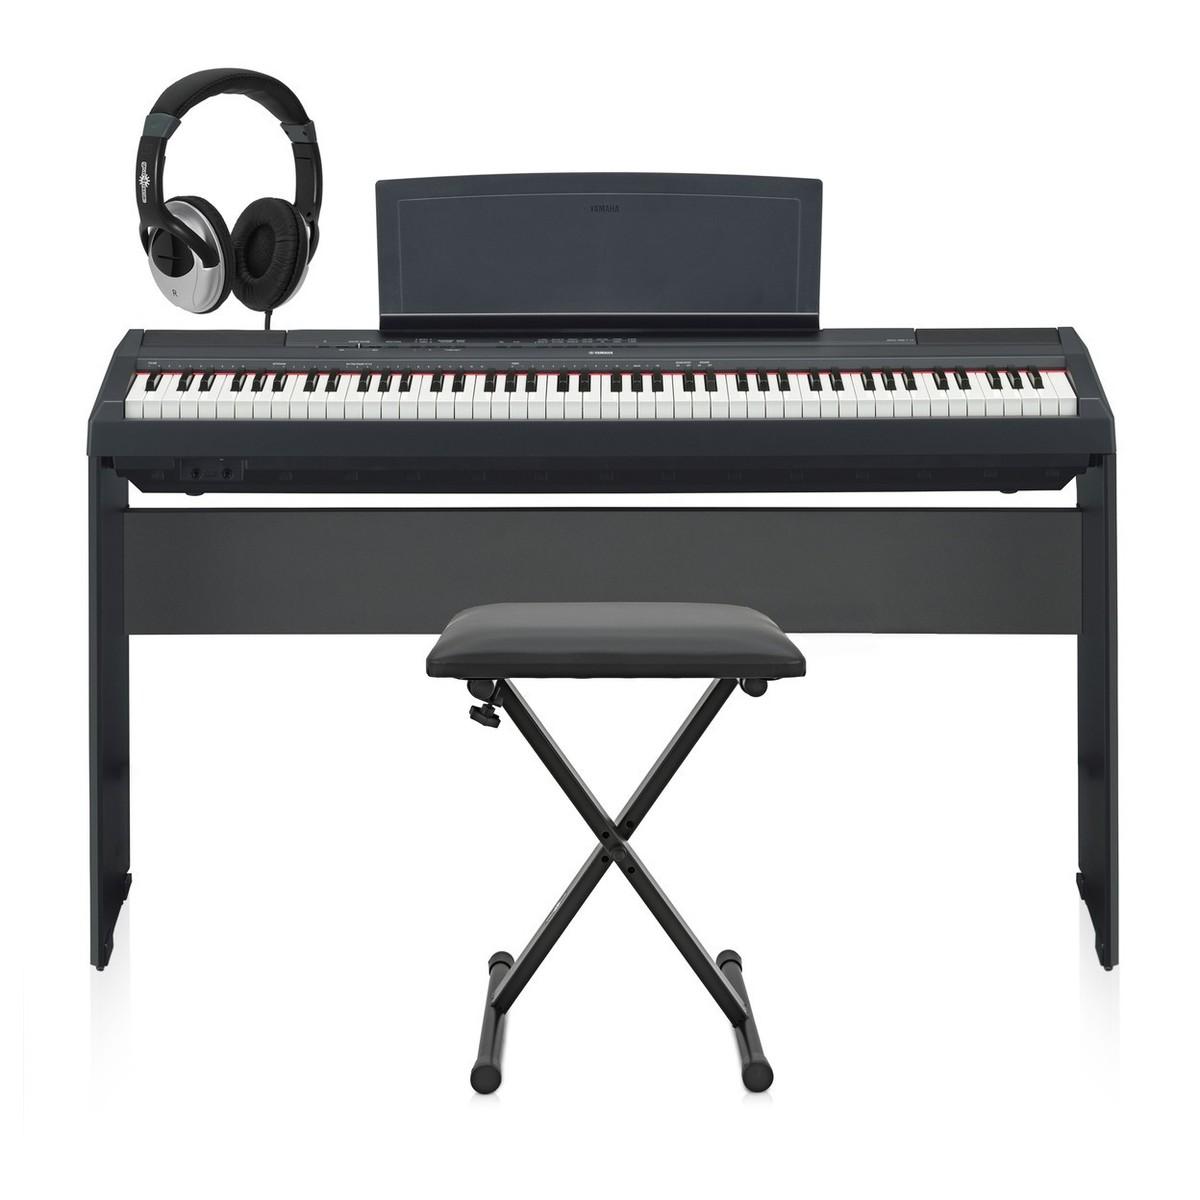 Yamaha p115 digital piano black with matching stand at for Yamaha p115 stand